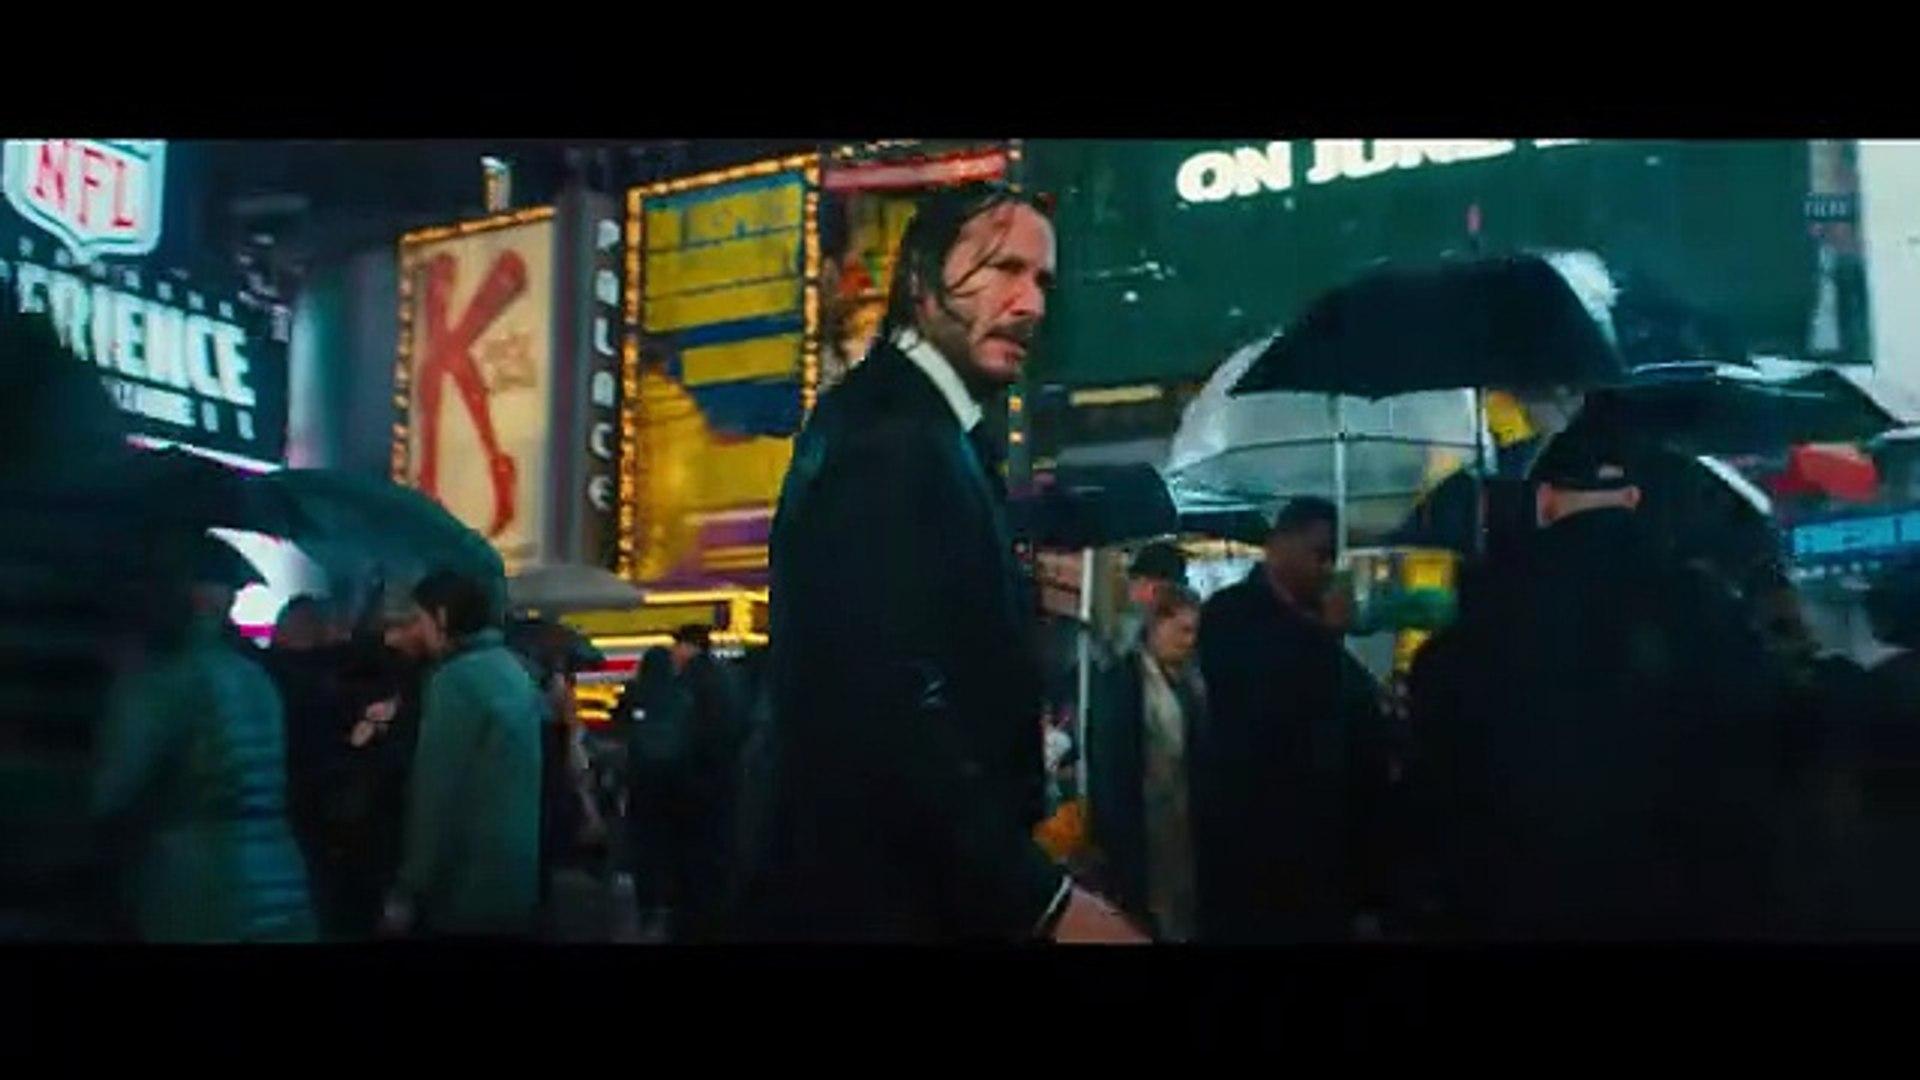 JOHN WICK CHAPTER 3 Official Trailer- Parabellum (2019) - Youtube